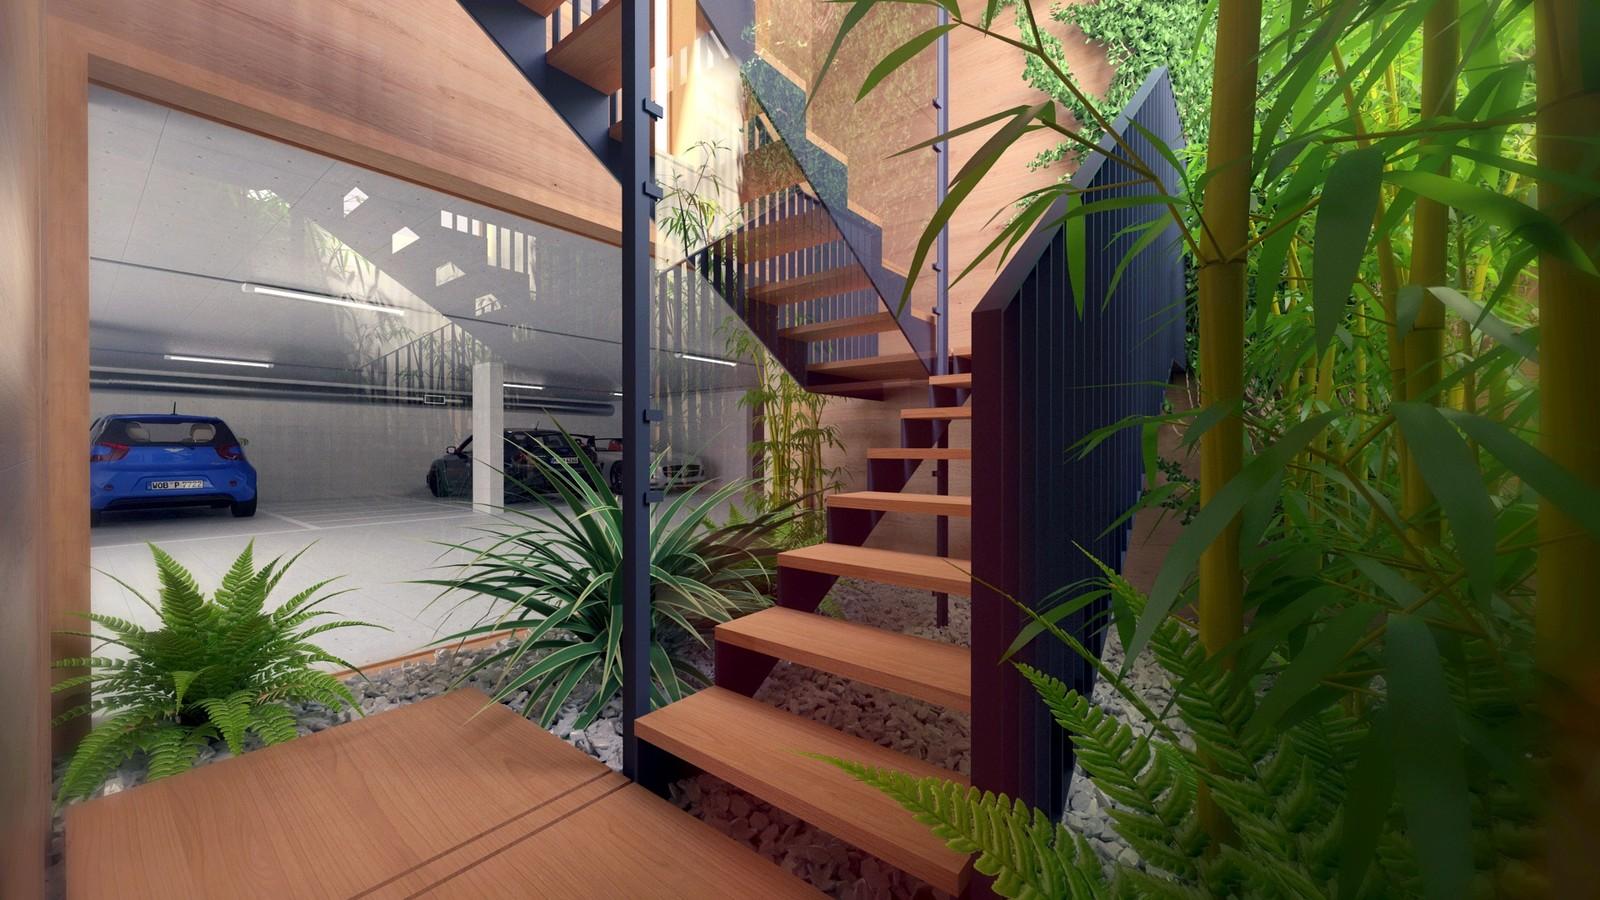 24 A1309-Villas Portier 3d STAIRCASE-GARAGE-Staircase Basement to Garage 02 Post  KP webpage of project: http://www.kemppro.com/KP_3D_communication_3_Villas_Veyrier.html